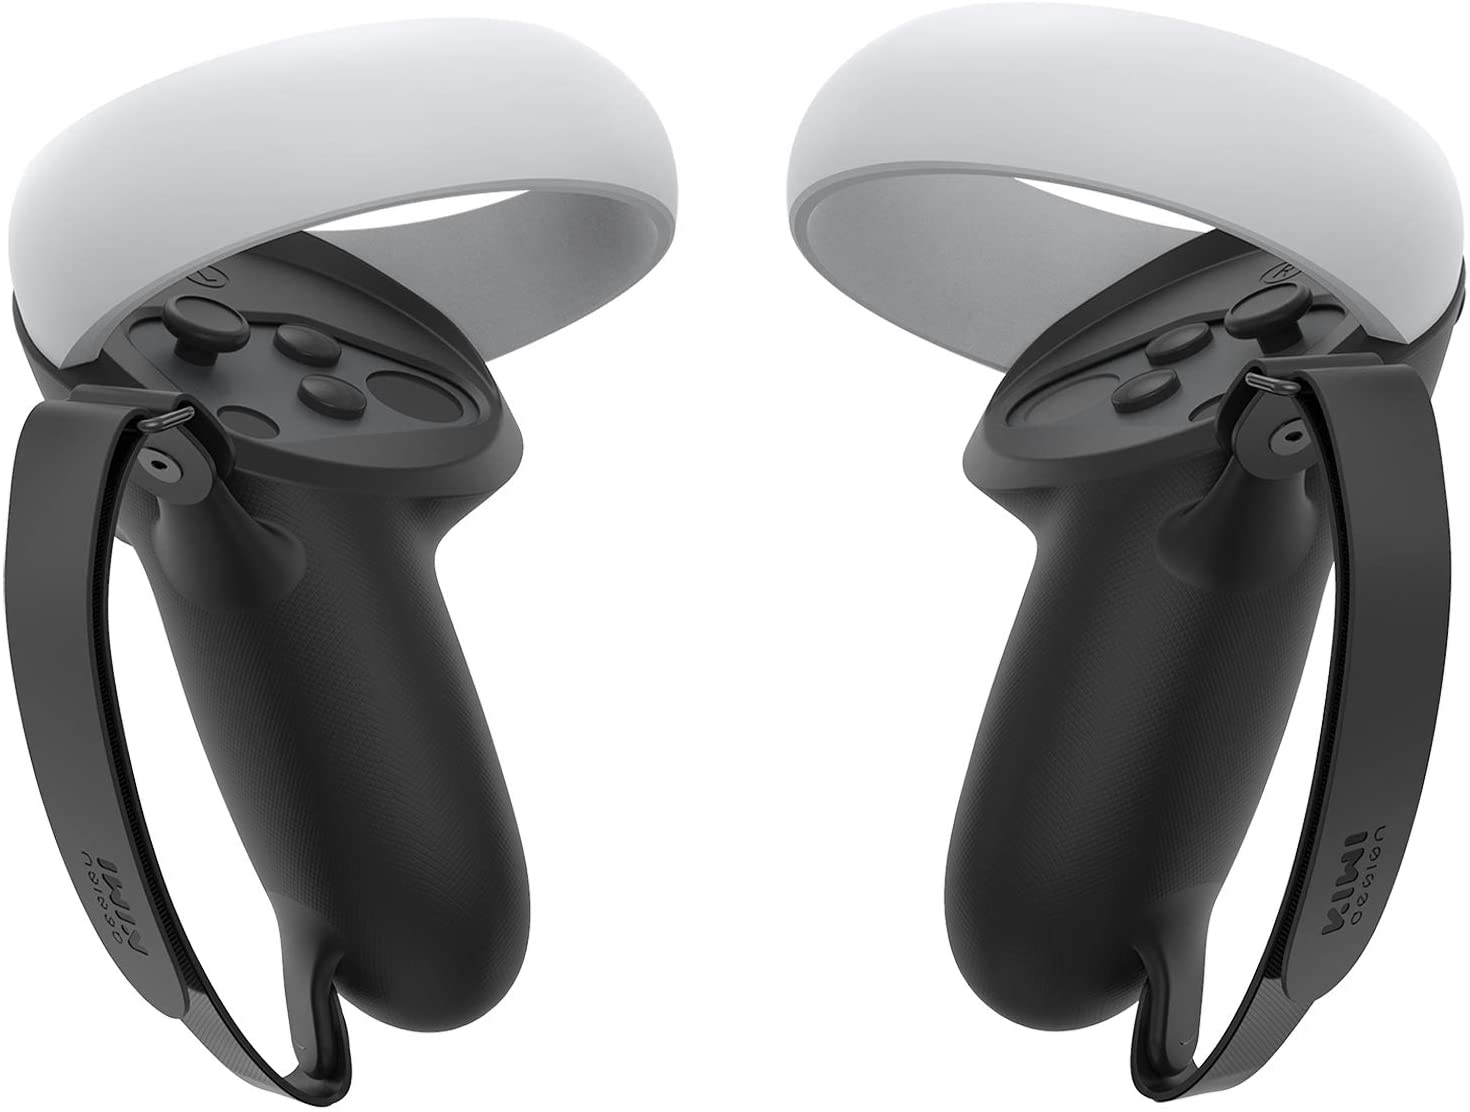 KIWI design Pro Version Grip Covers for Oculus Quest 2 Review